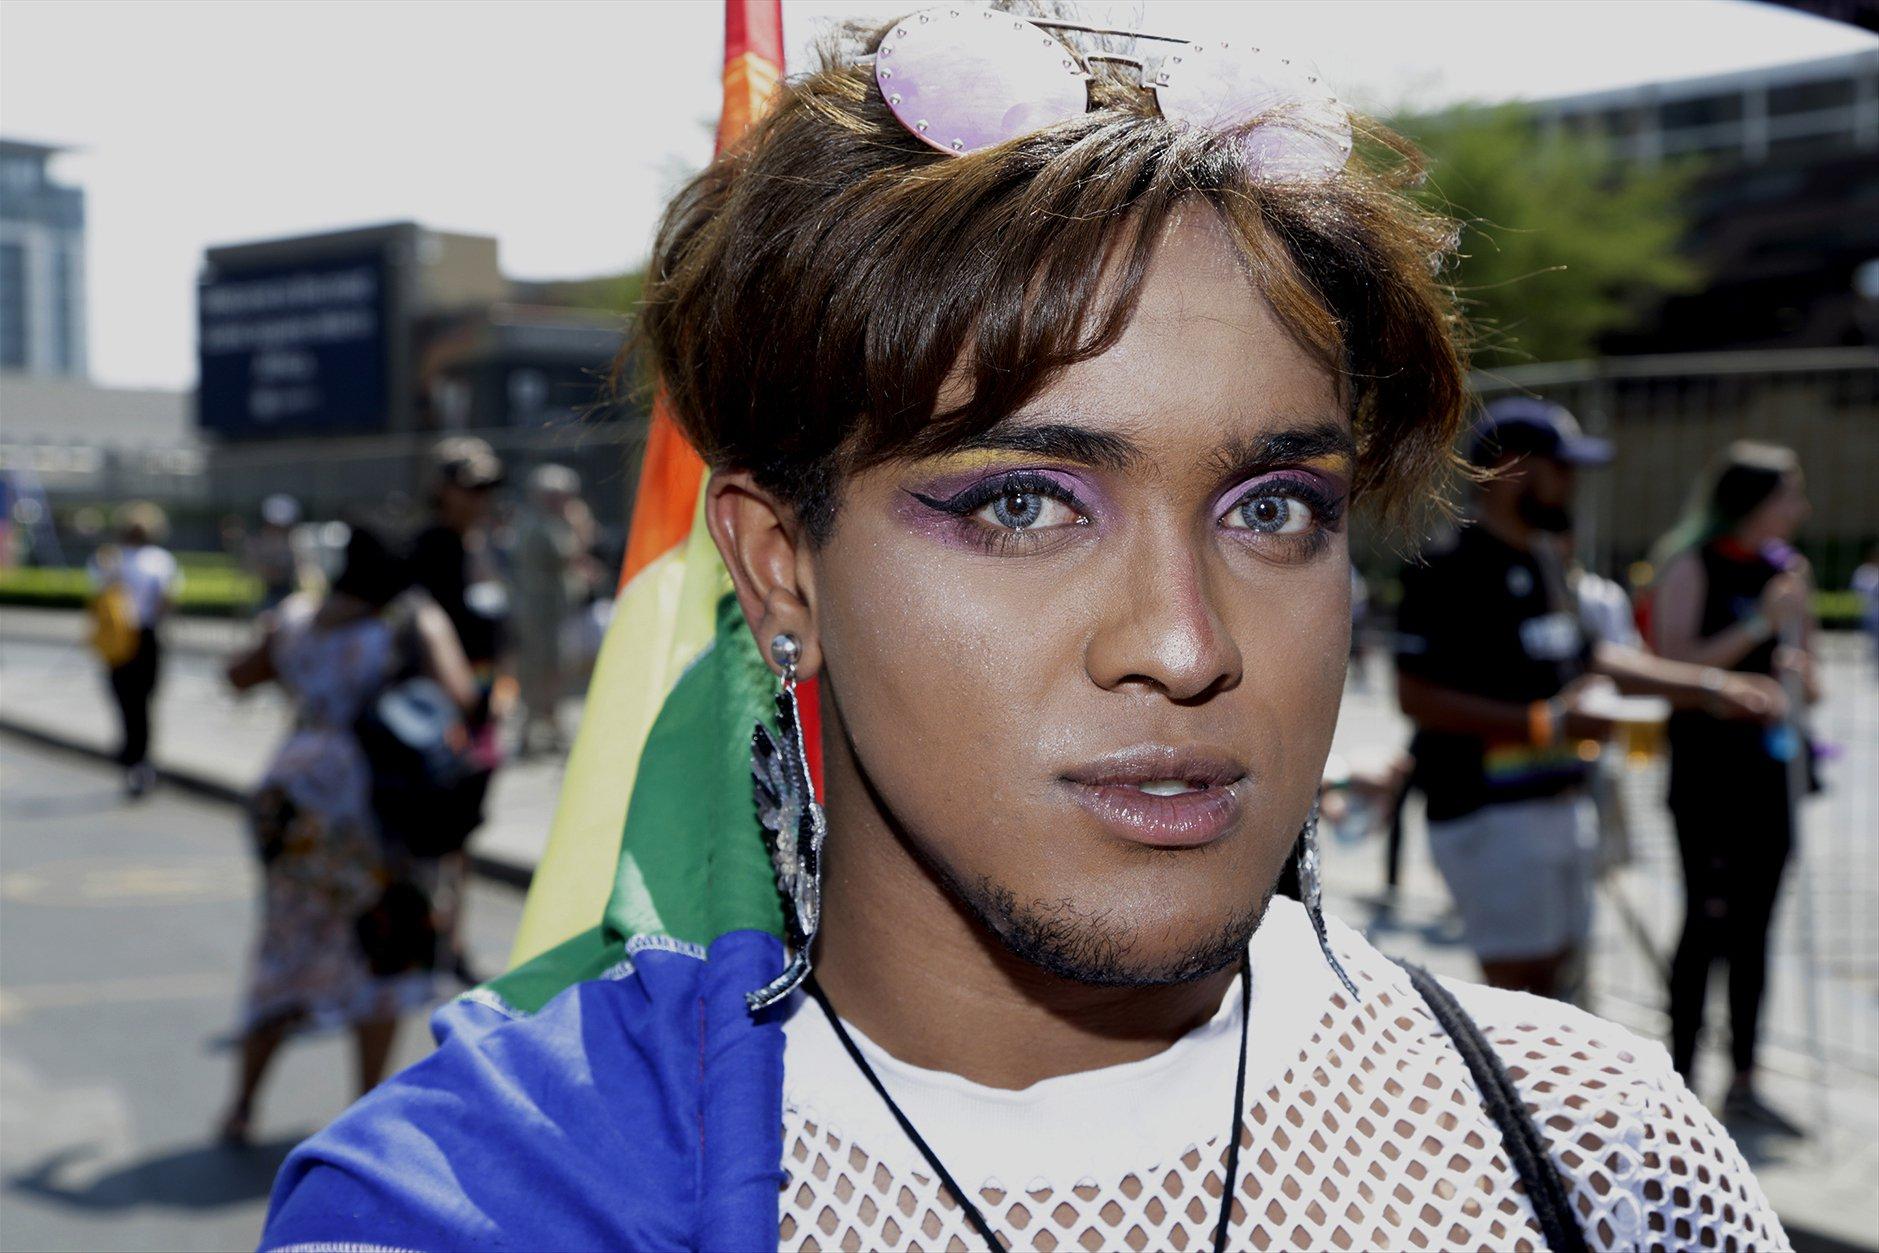 Johannesburg_Pride_LGBTQ_Noncedo Gxekwa_029.jpg